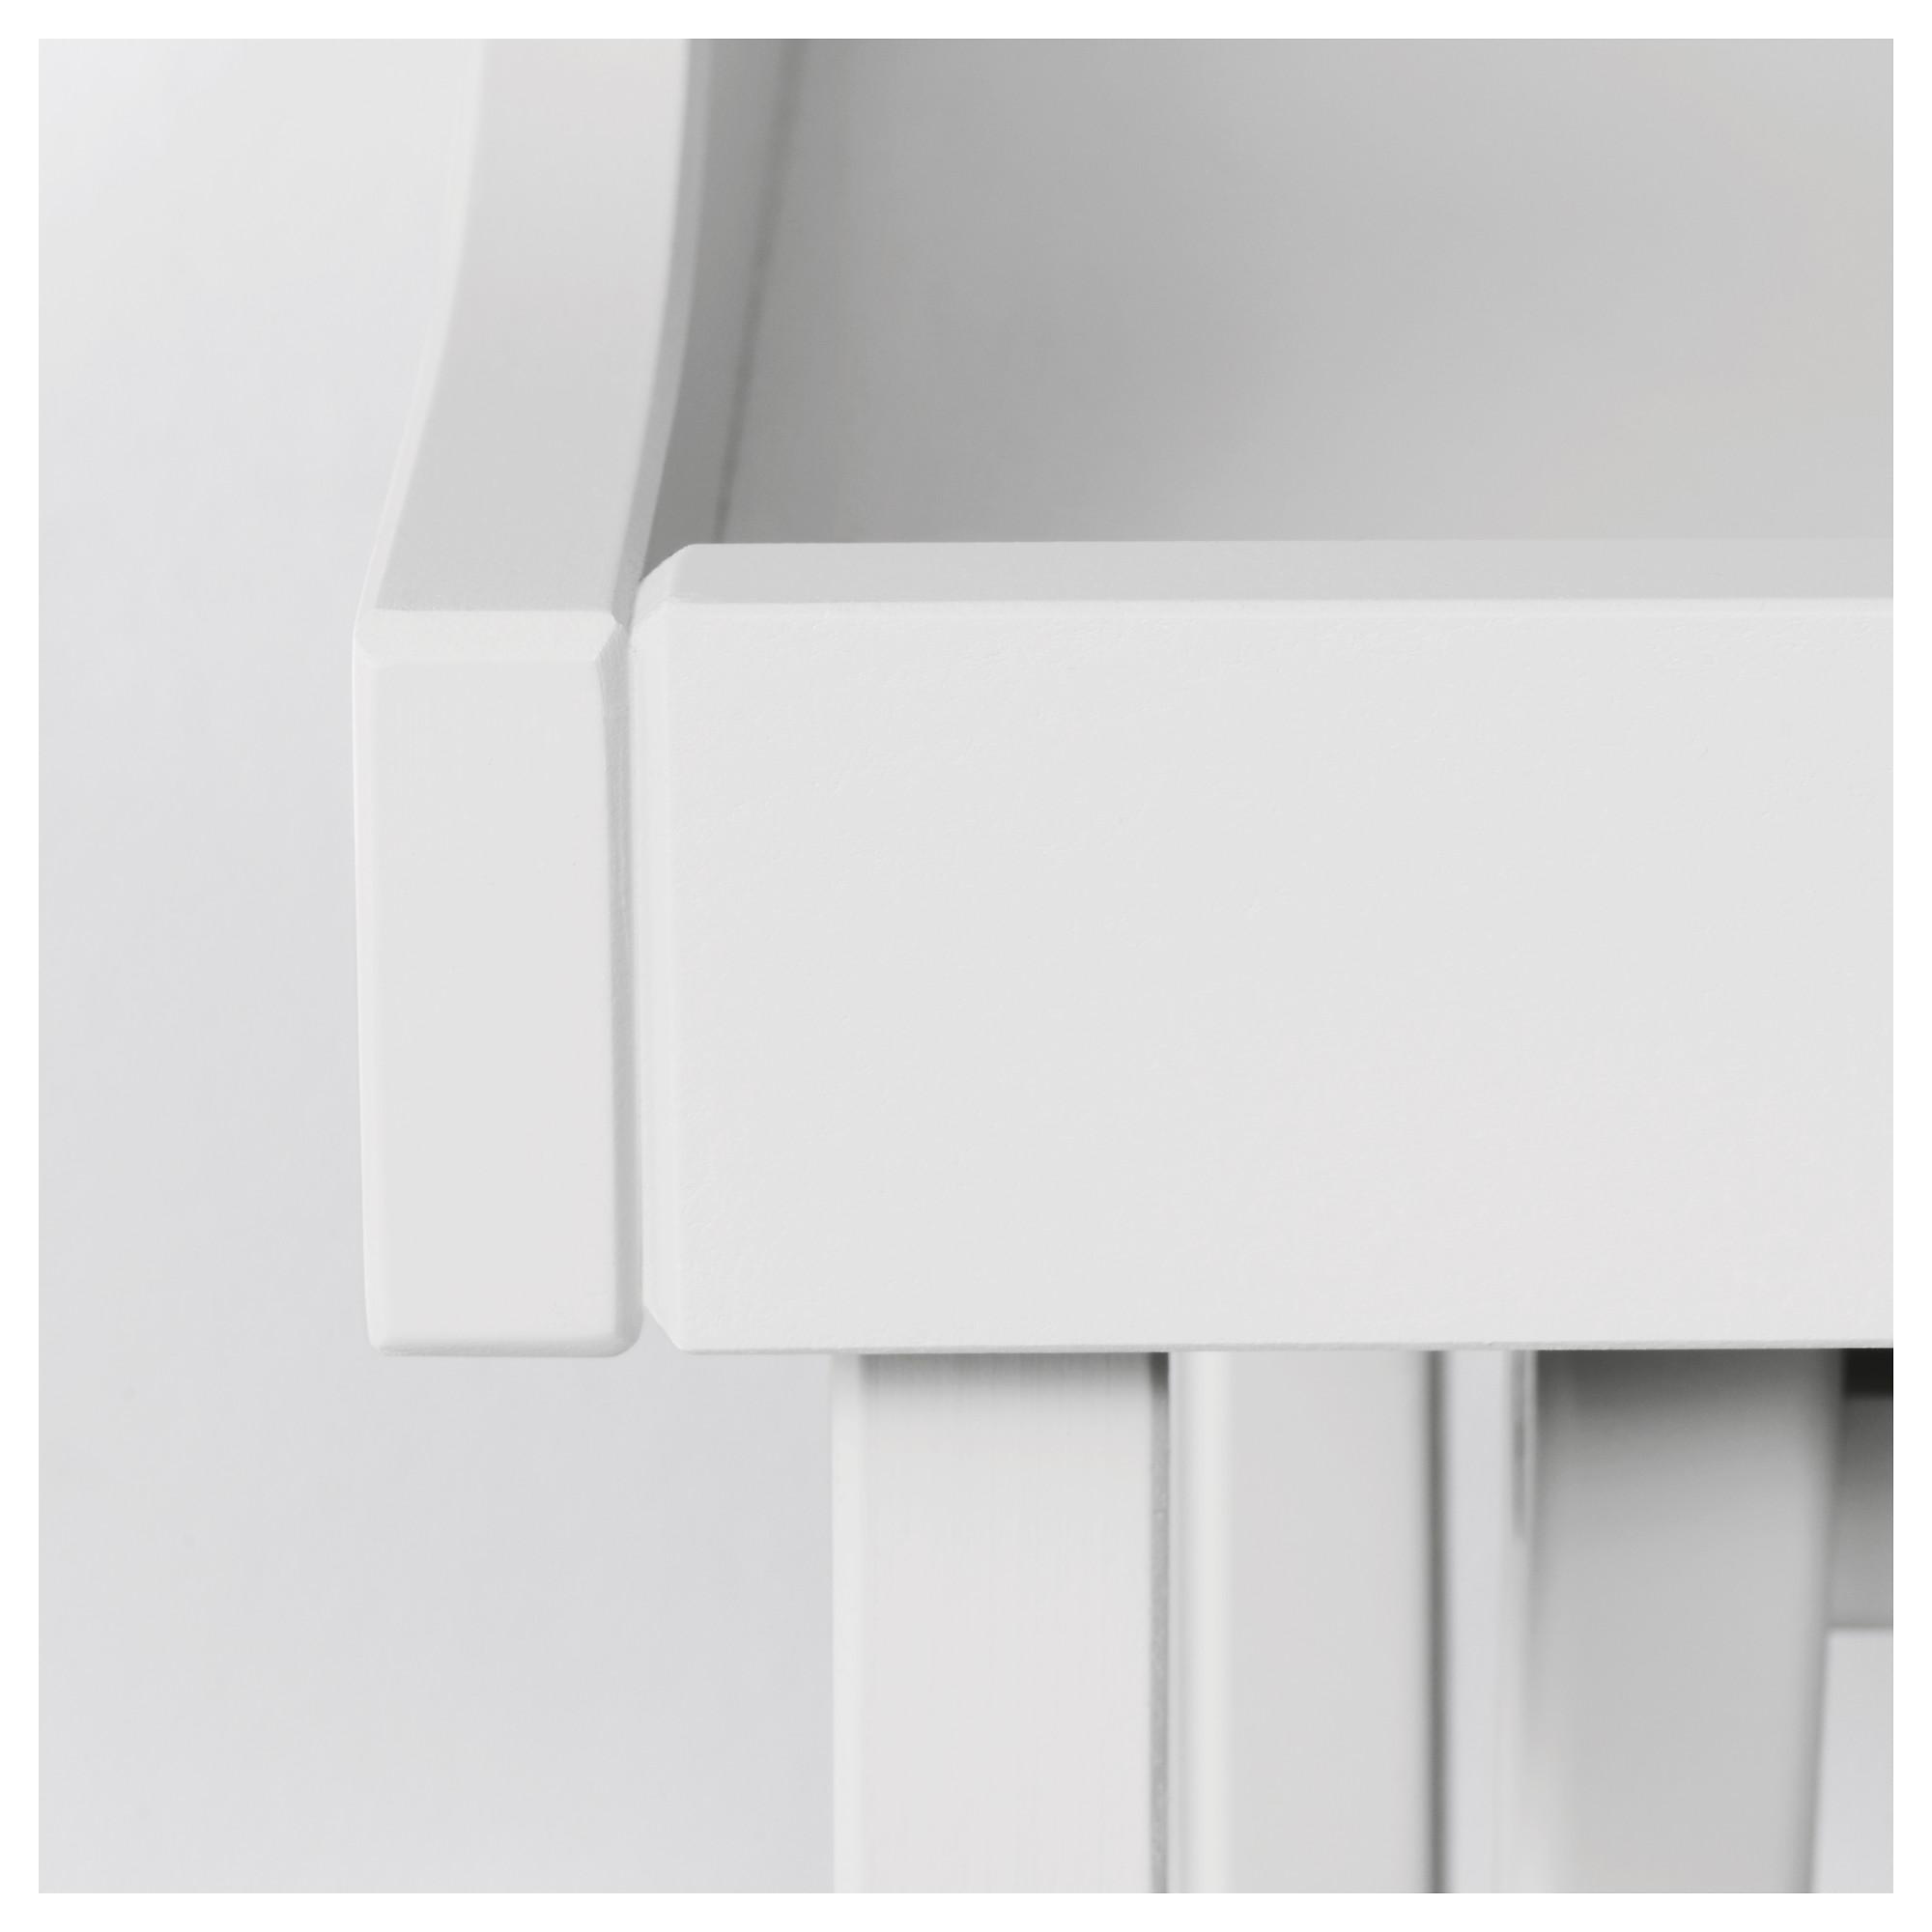 Folding Tray Table Ikea.Ikea Lithuania Shop For Furniture Lighting Home